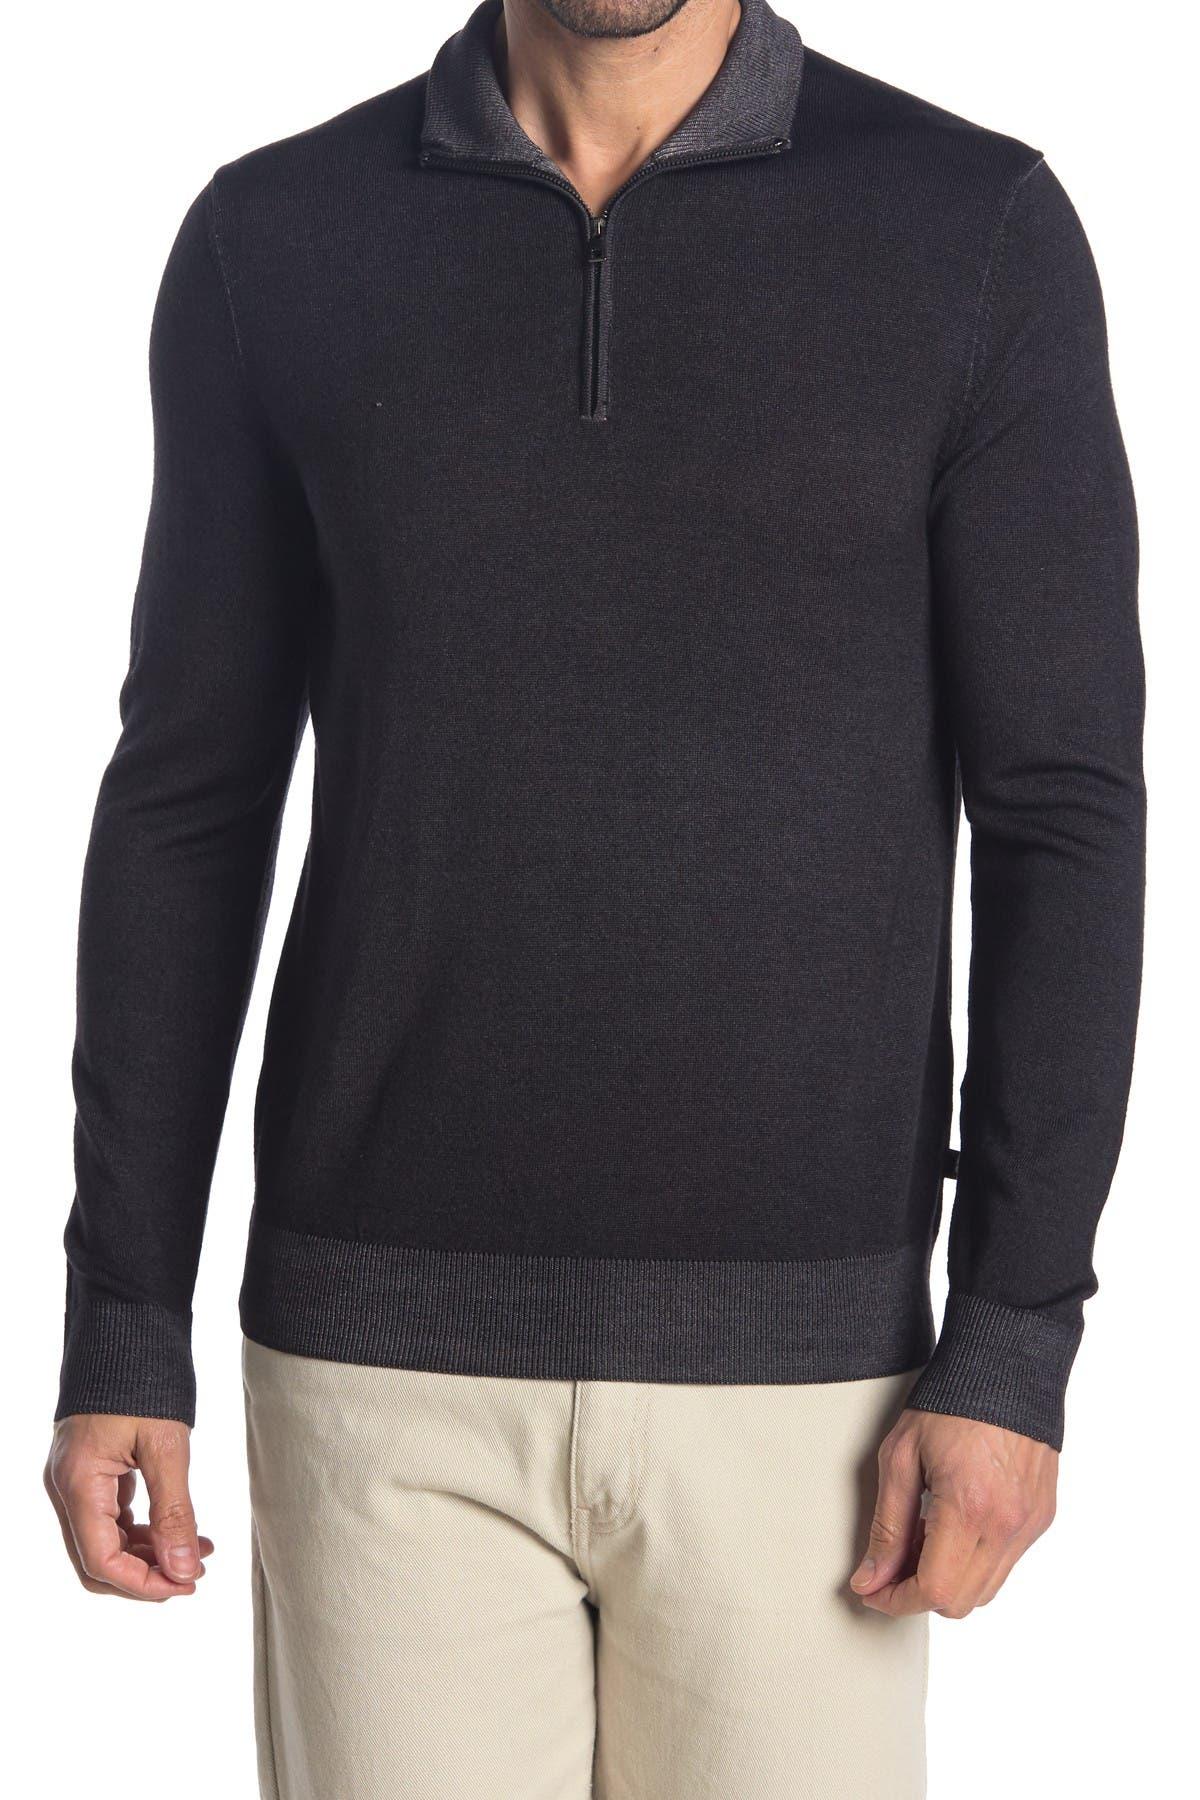 Image of Michael Kors Half Zip Knit Wool Sweater